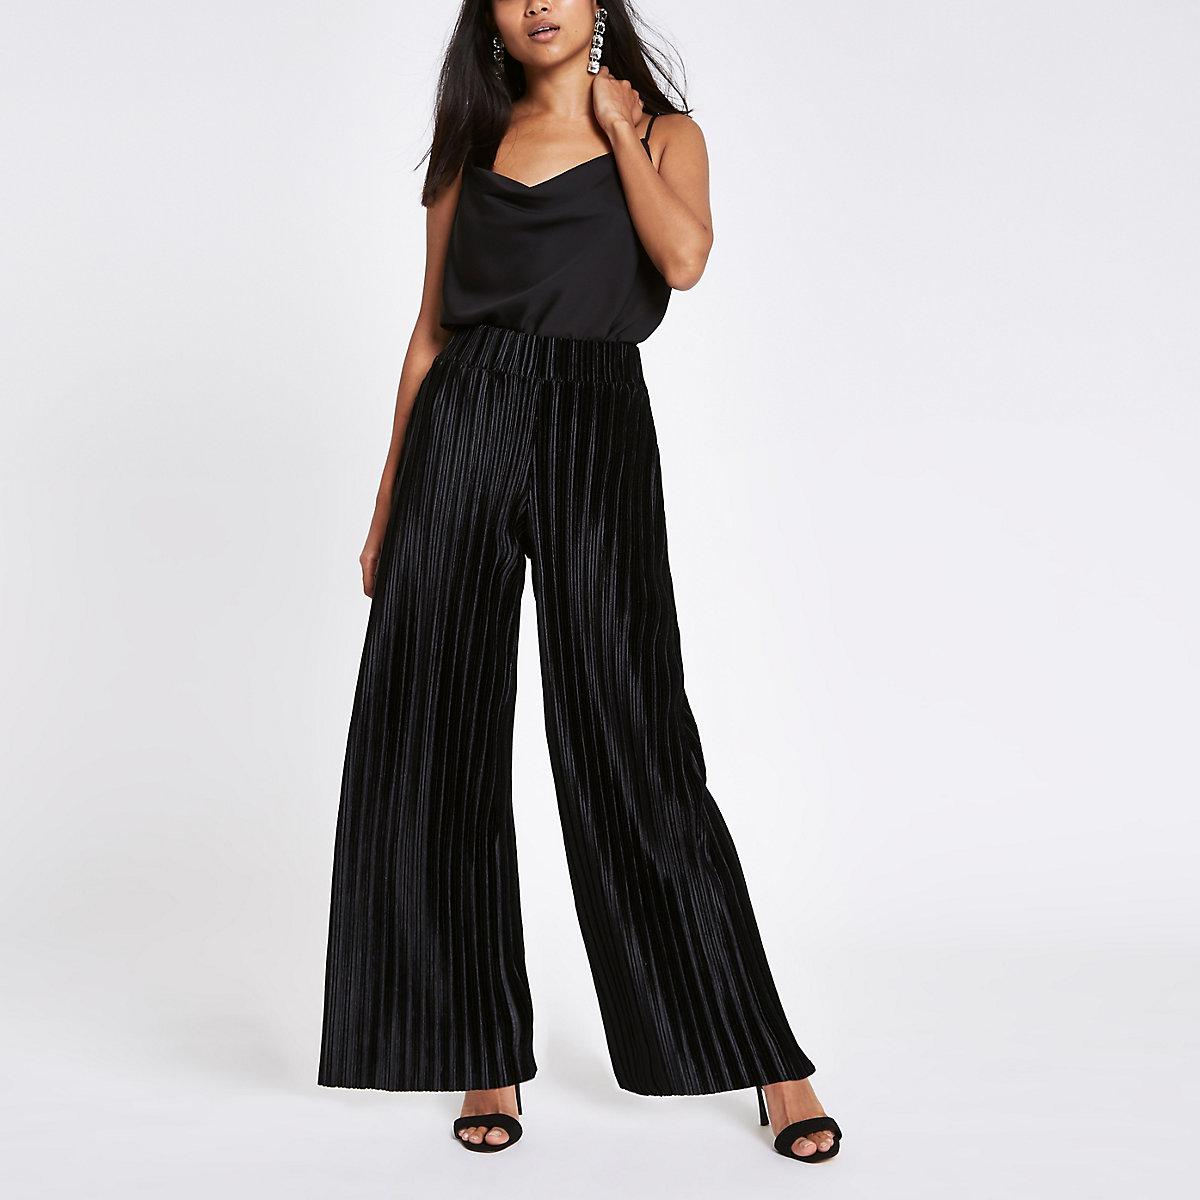 Petite black plisse wide leg trousers